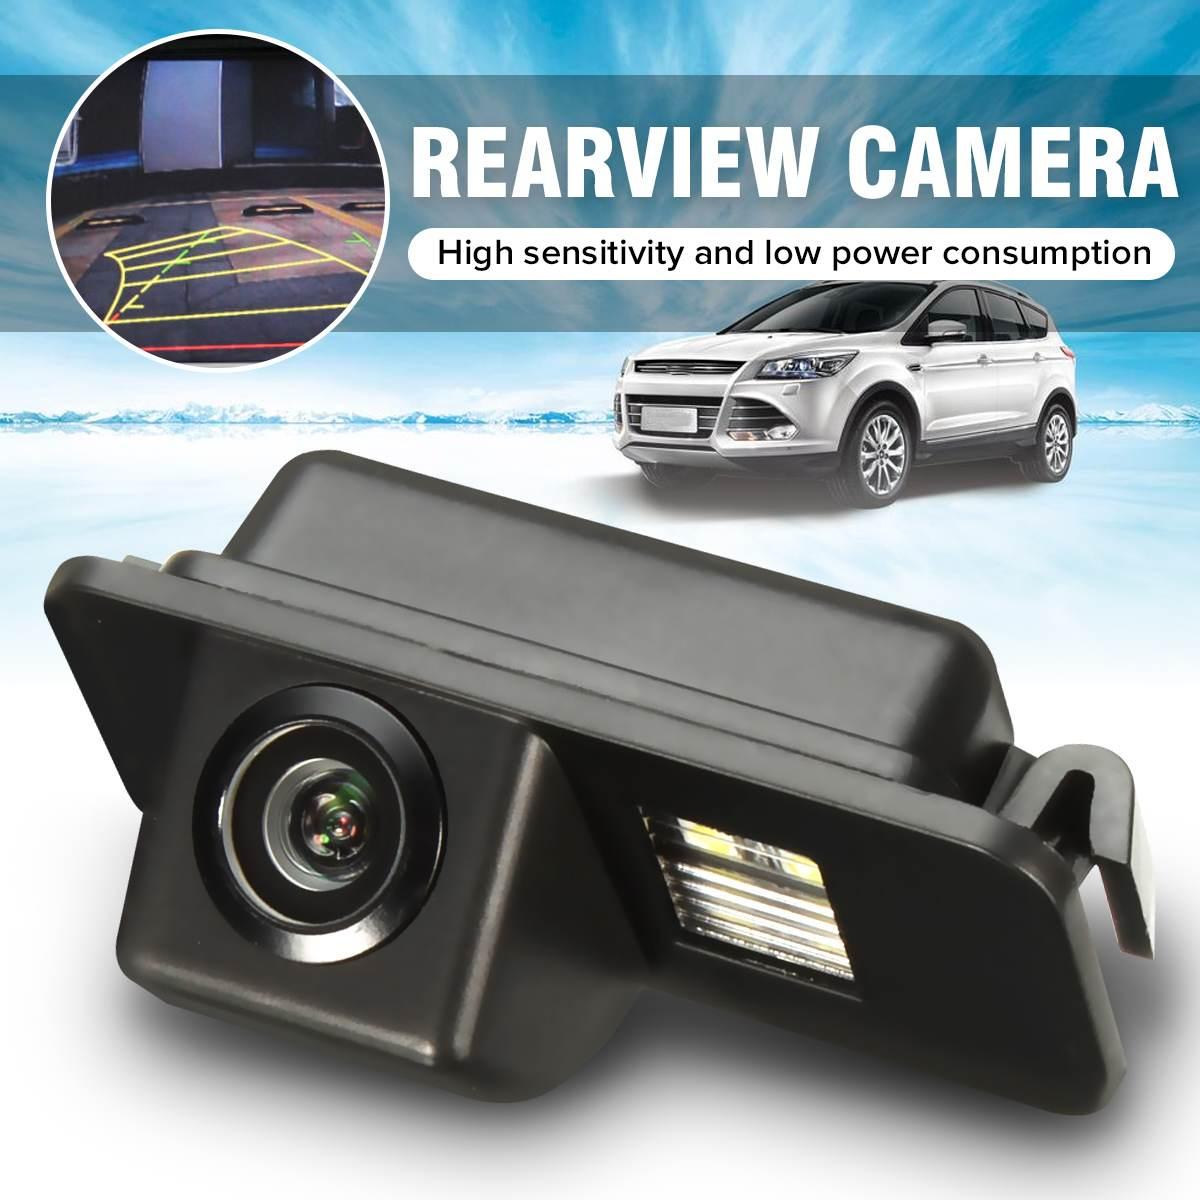 Cámara inalámbrica CCD HD vista trasera de coche visión nocturna de aparcamiento inverso impermeable para Ford Mondeo BA7 Focus C307 s-max Fiesta Kuga